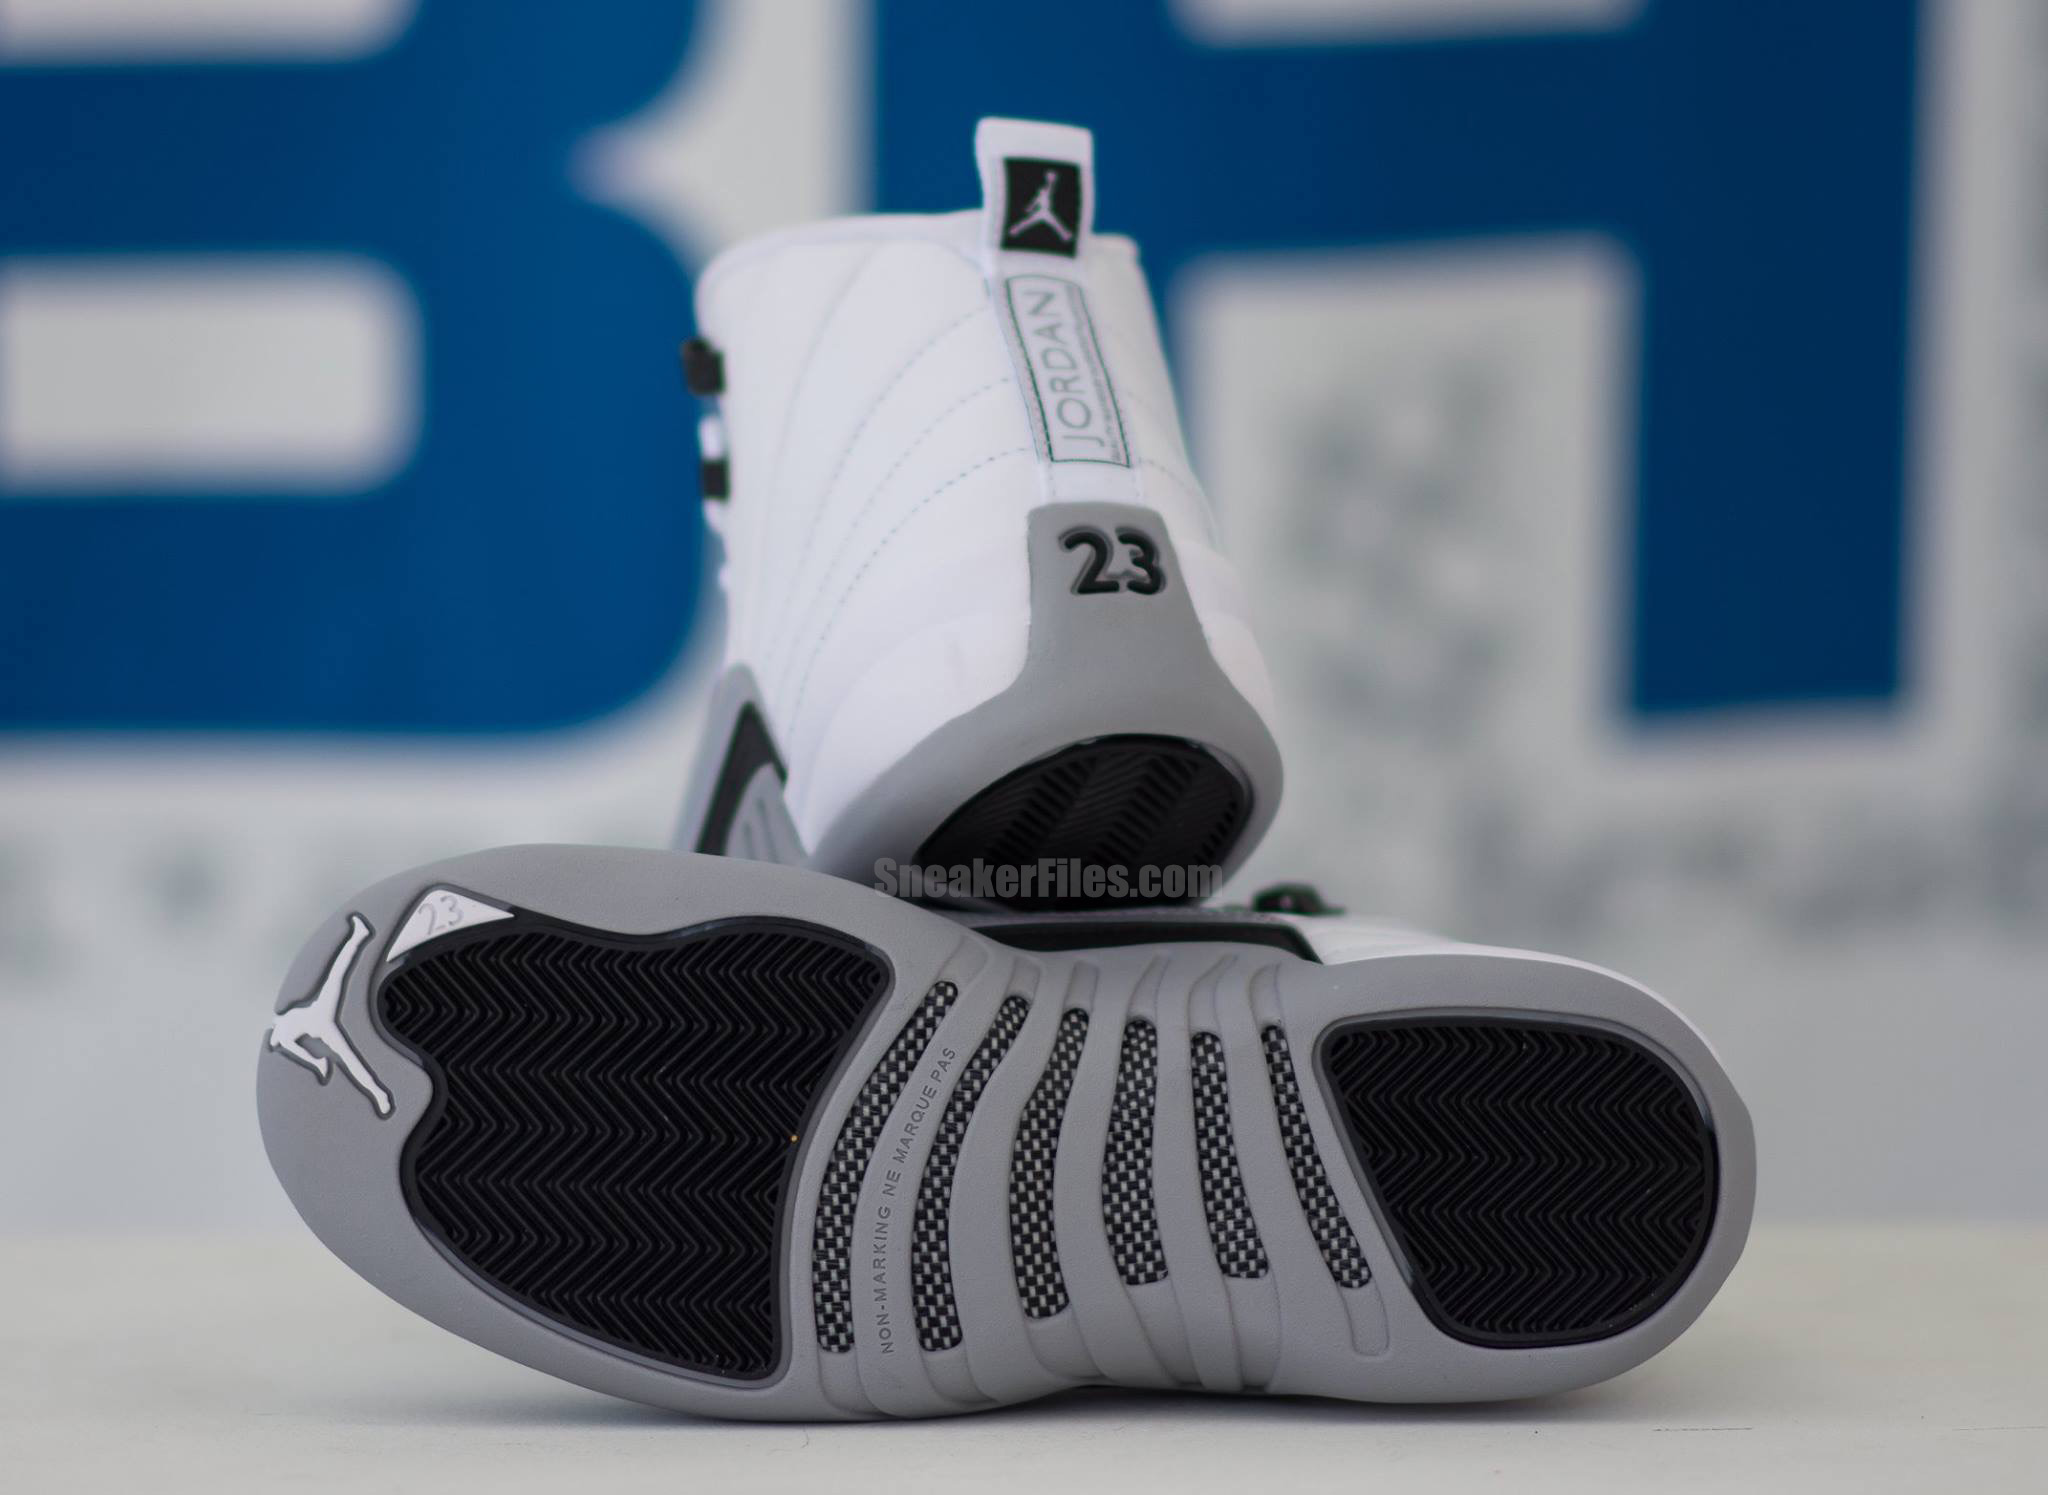 Barons Air Jordan 12